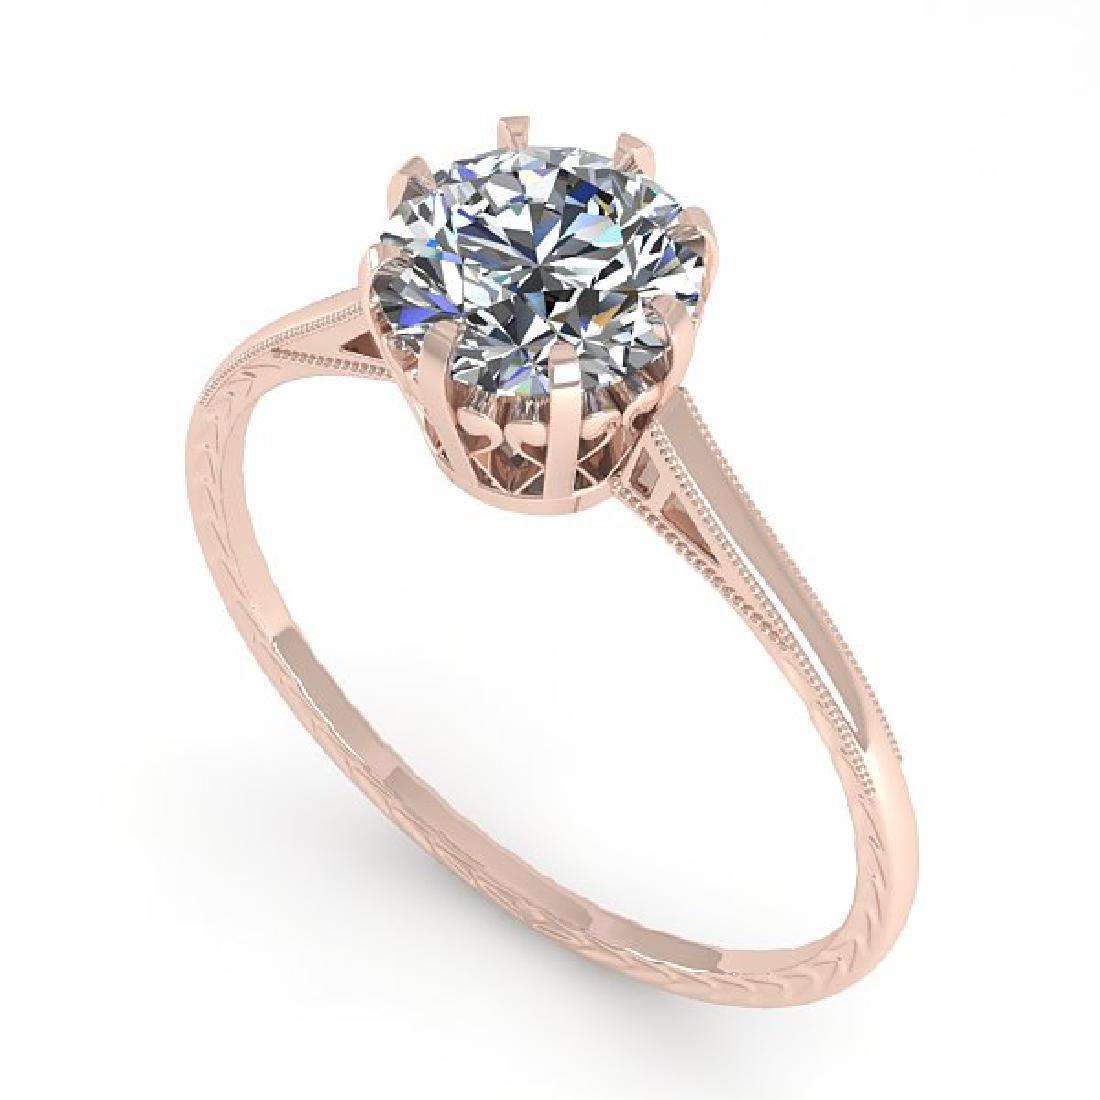 1.0 CTW Certified VS/SI Diamond Ring 14K Rose Gold - 2